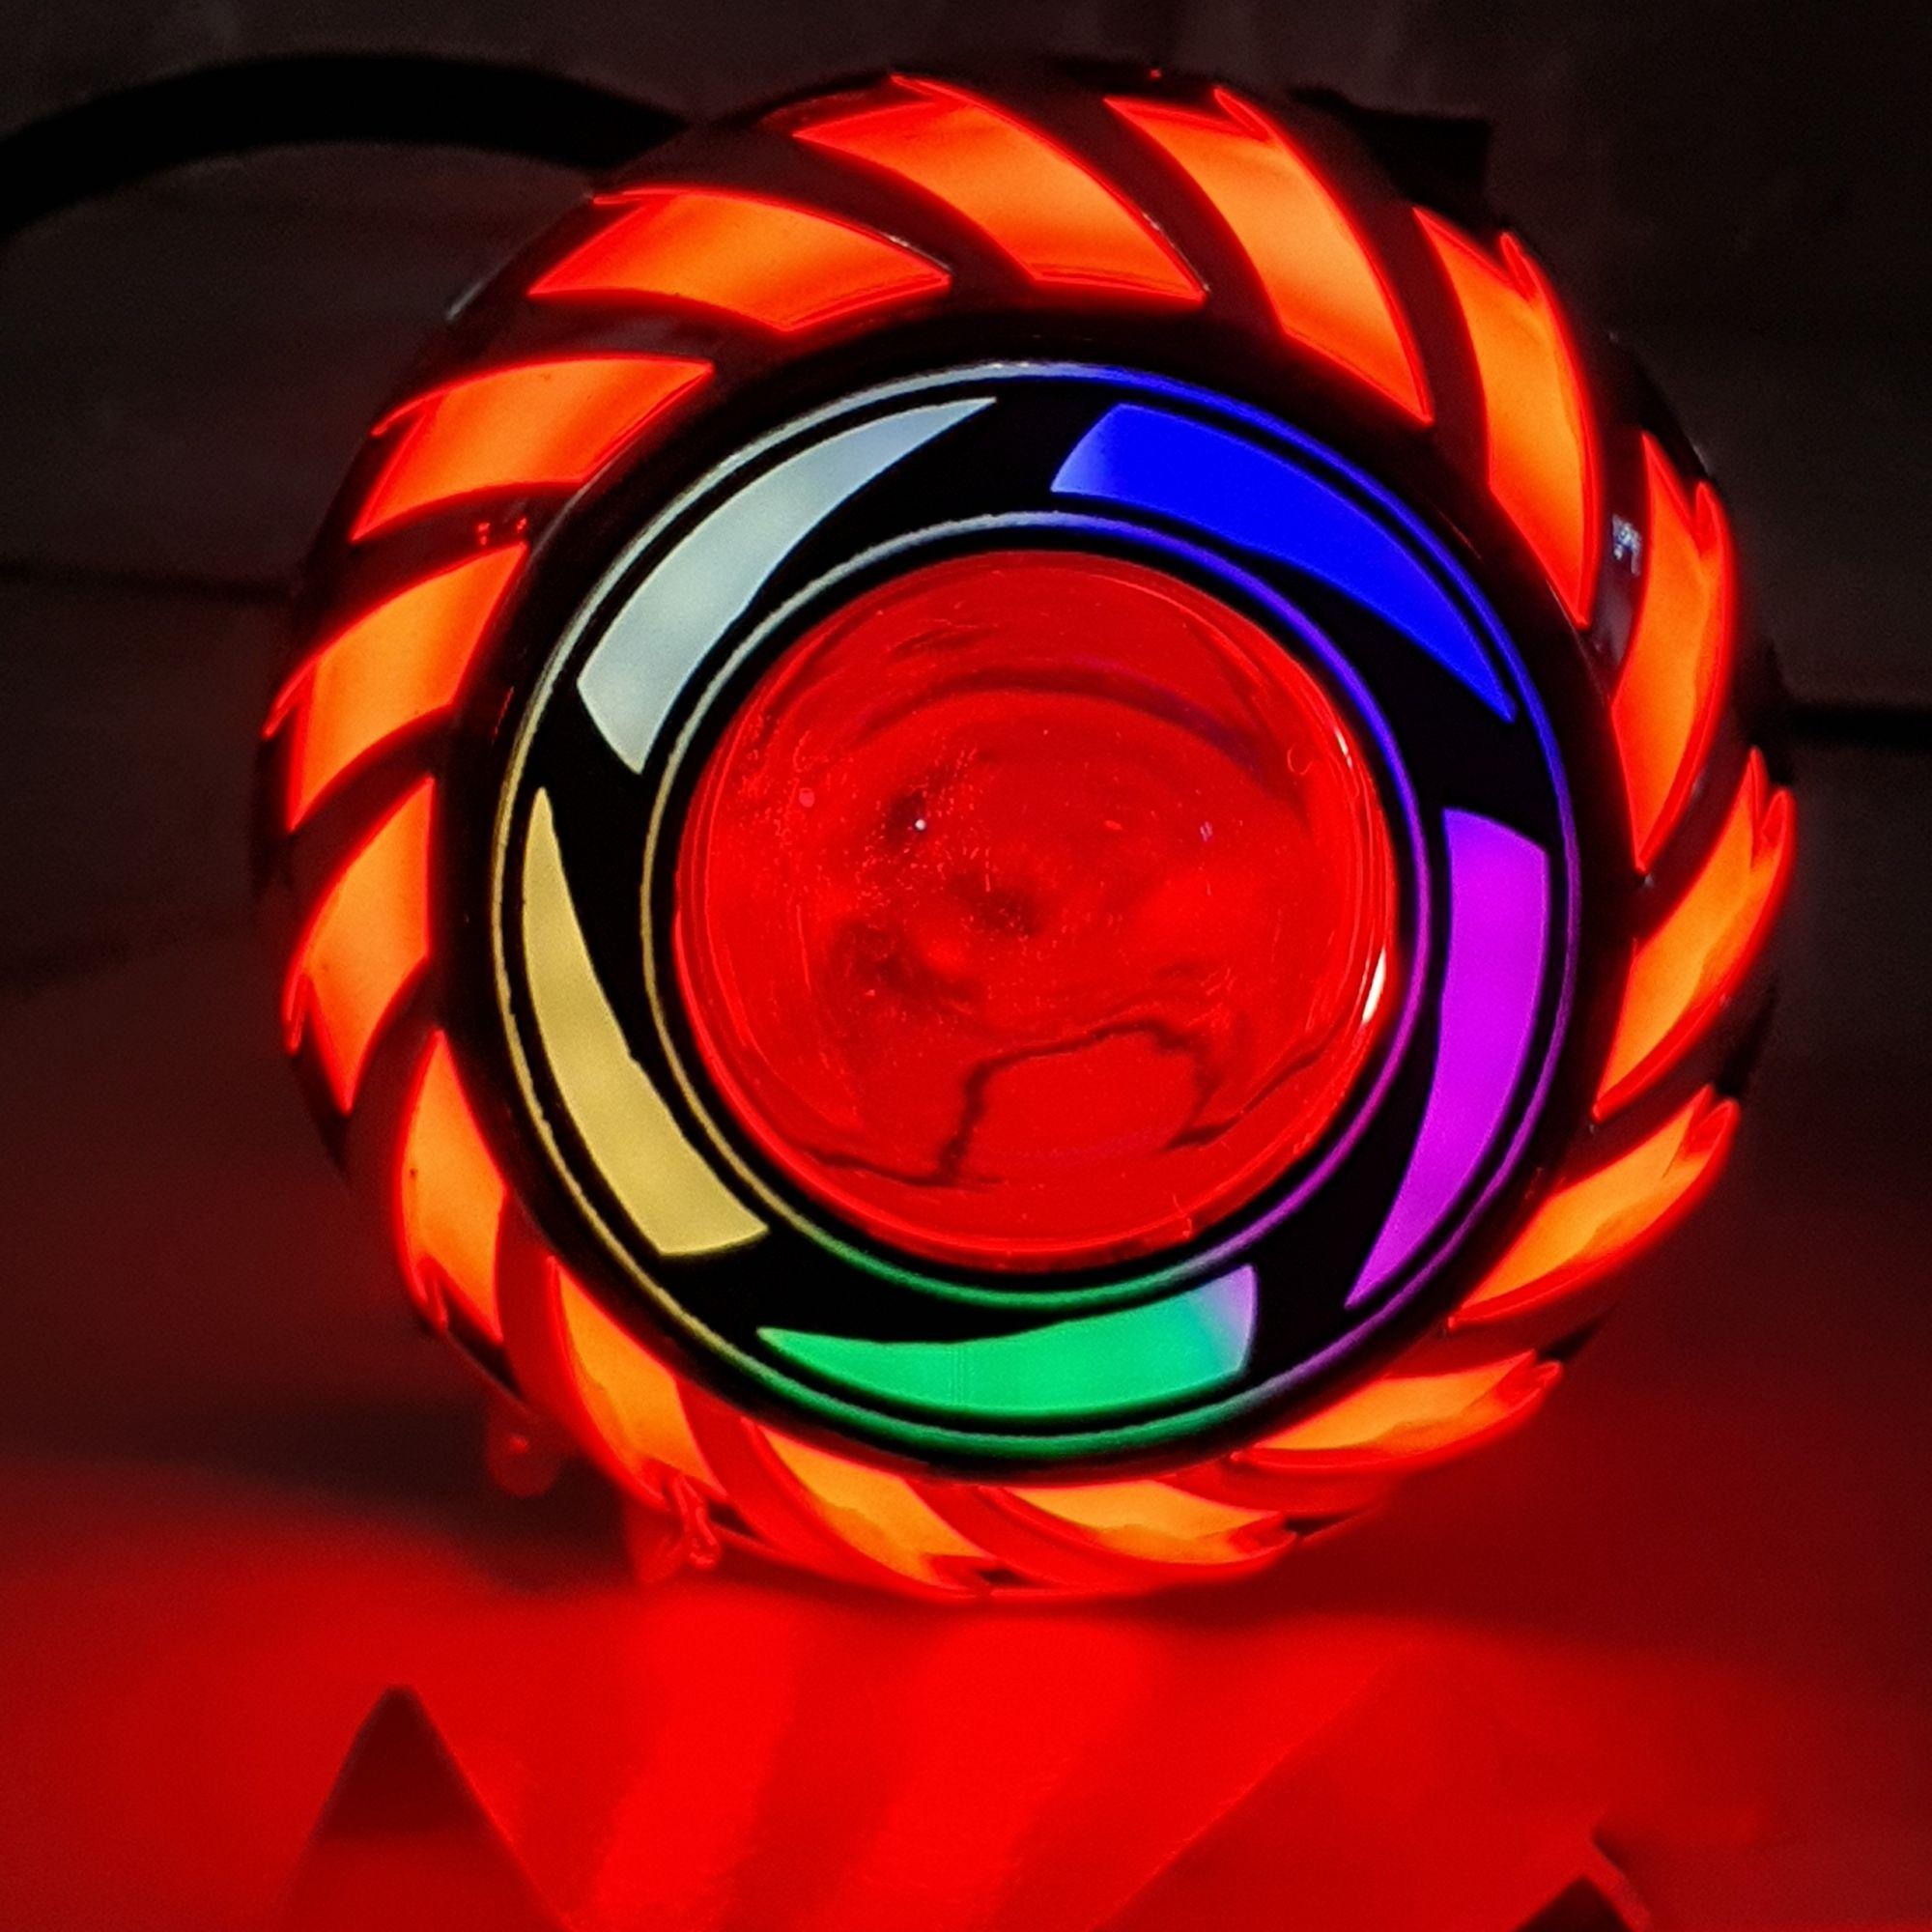 LAMPU DEPAN LED PROJIE MINI MODEL KIPAS